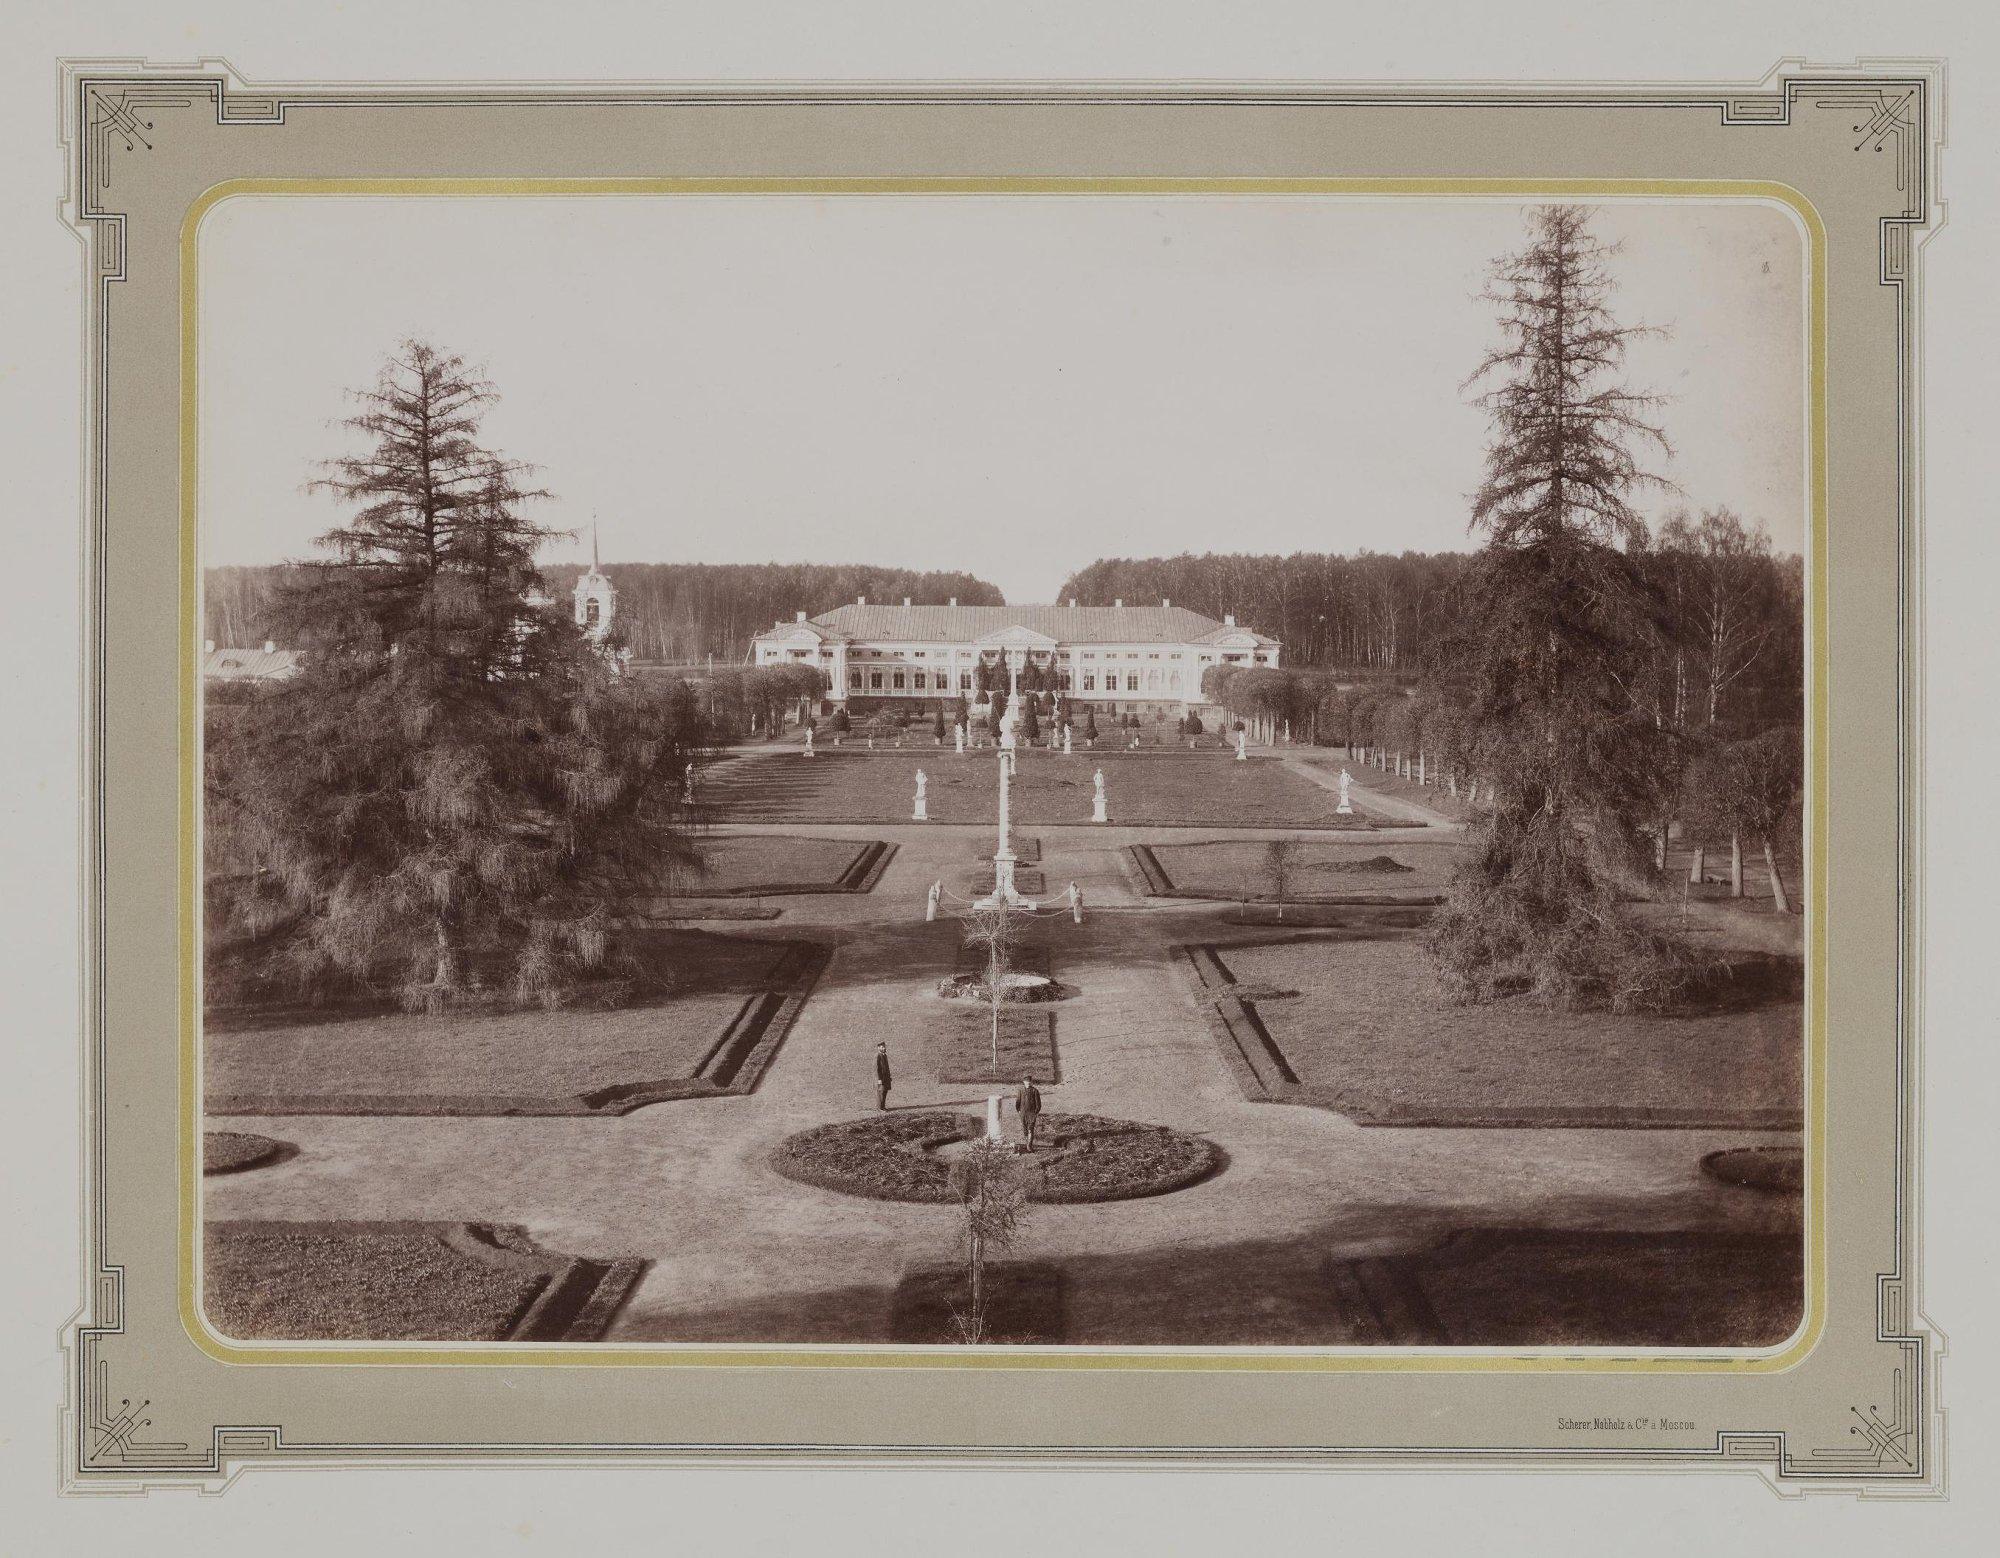 1883-1886. Усадьба Кусково. Вид на парковый партер со стороны оранжереи